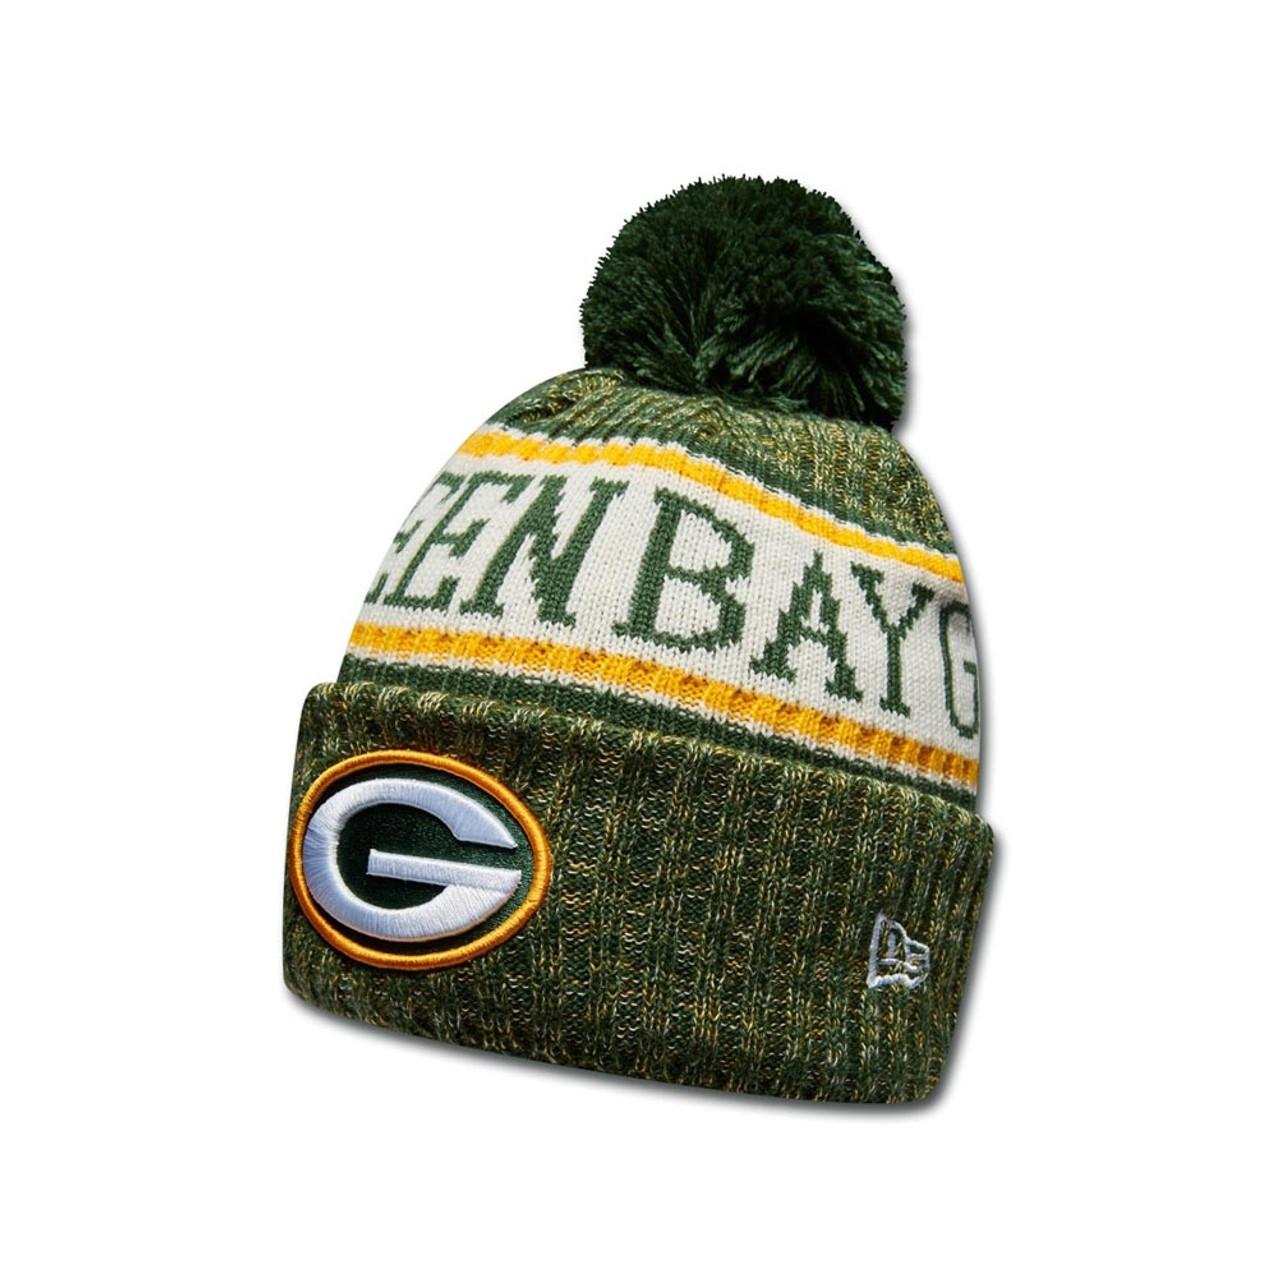 ff6d7dca0 NEW ERA Green Bay Packers NFL sideline knit bobble beanie hat ...